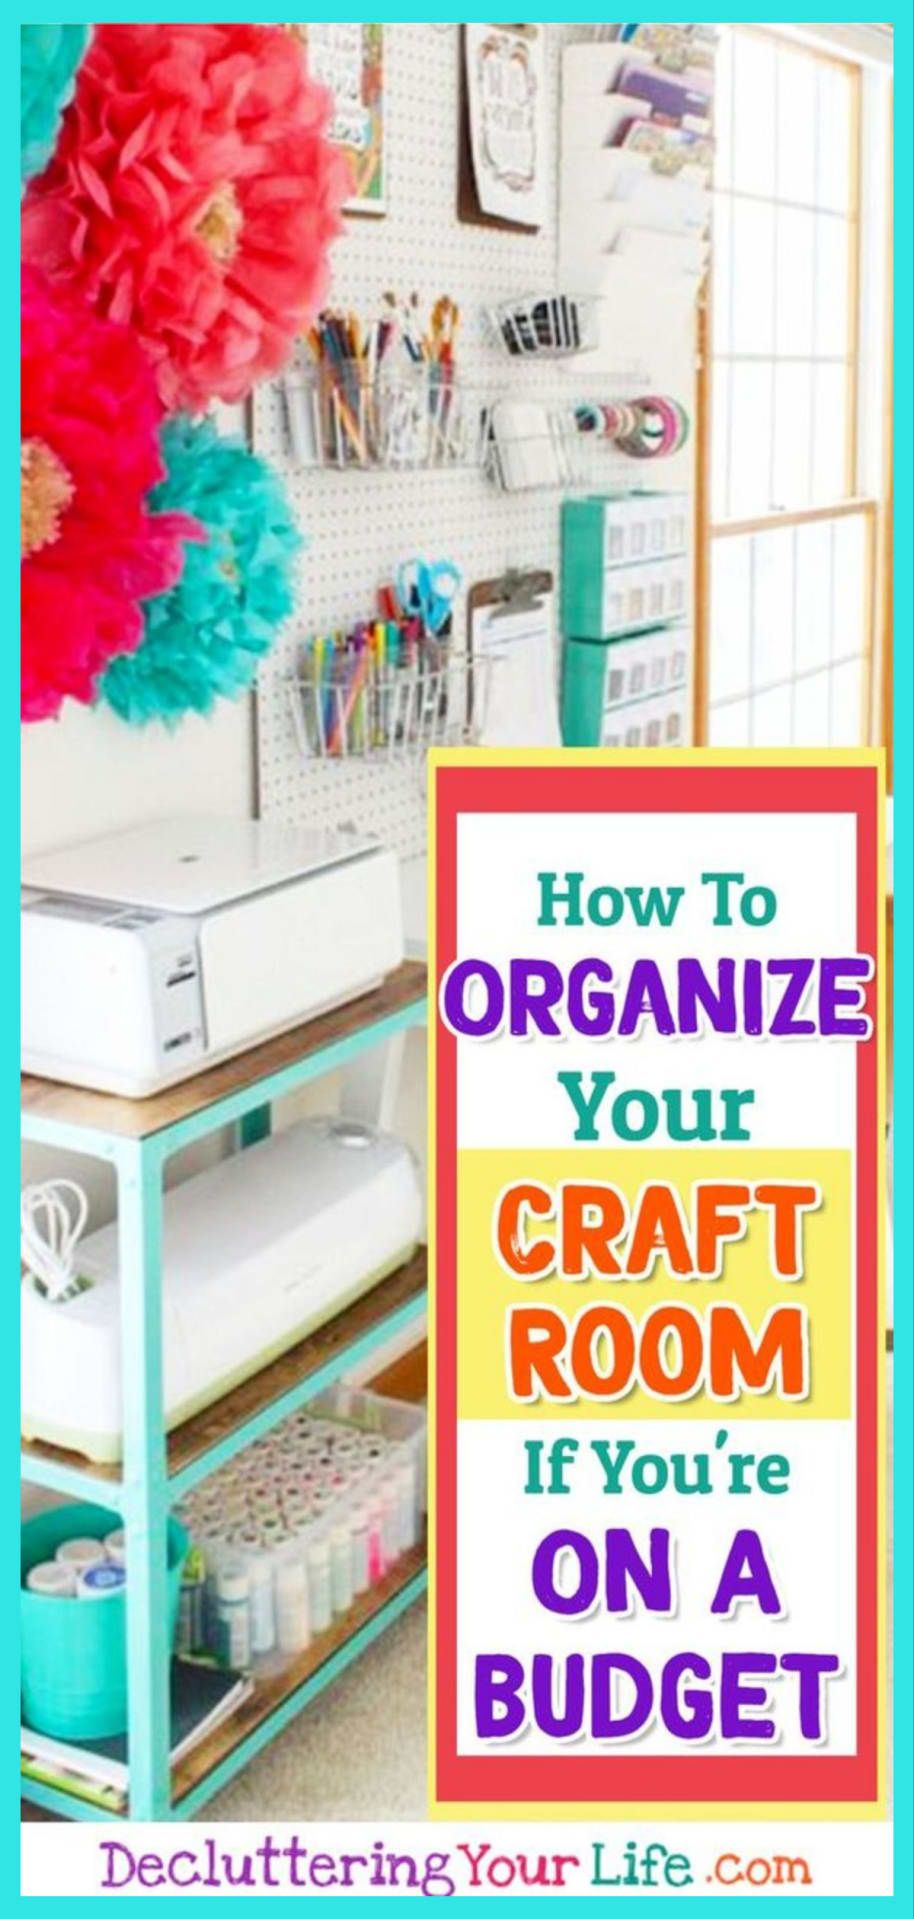 Cheap Craft Room Ideas On A Budget Craft Room And Craft Supplies Organization Ideas On A Bud Craft Room Organization Diy Craft Storage Diy Craft Organization